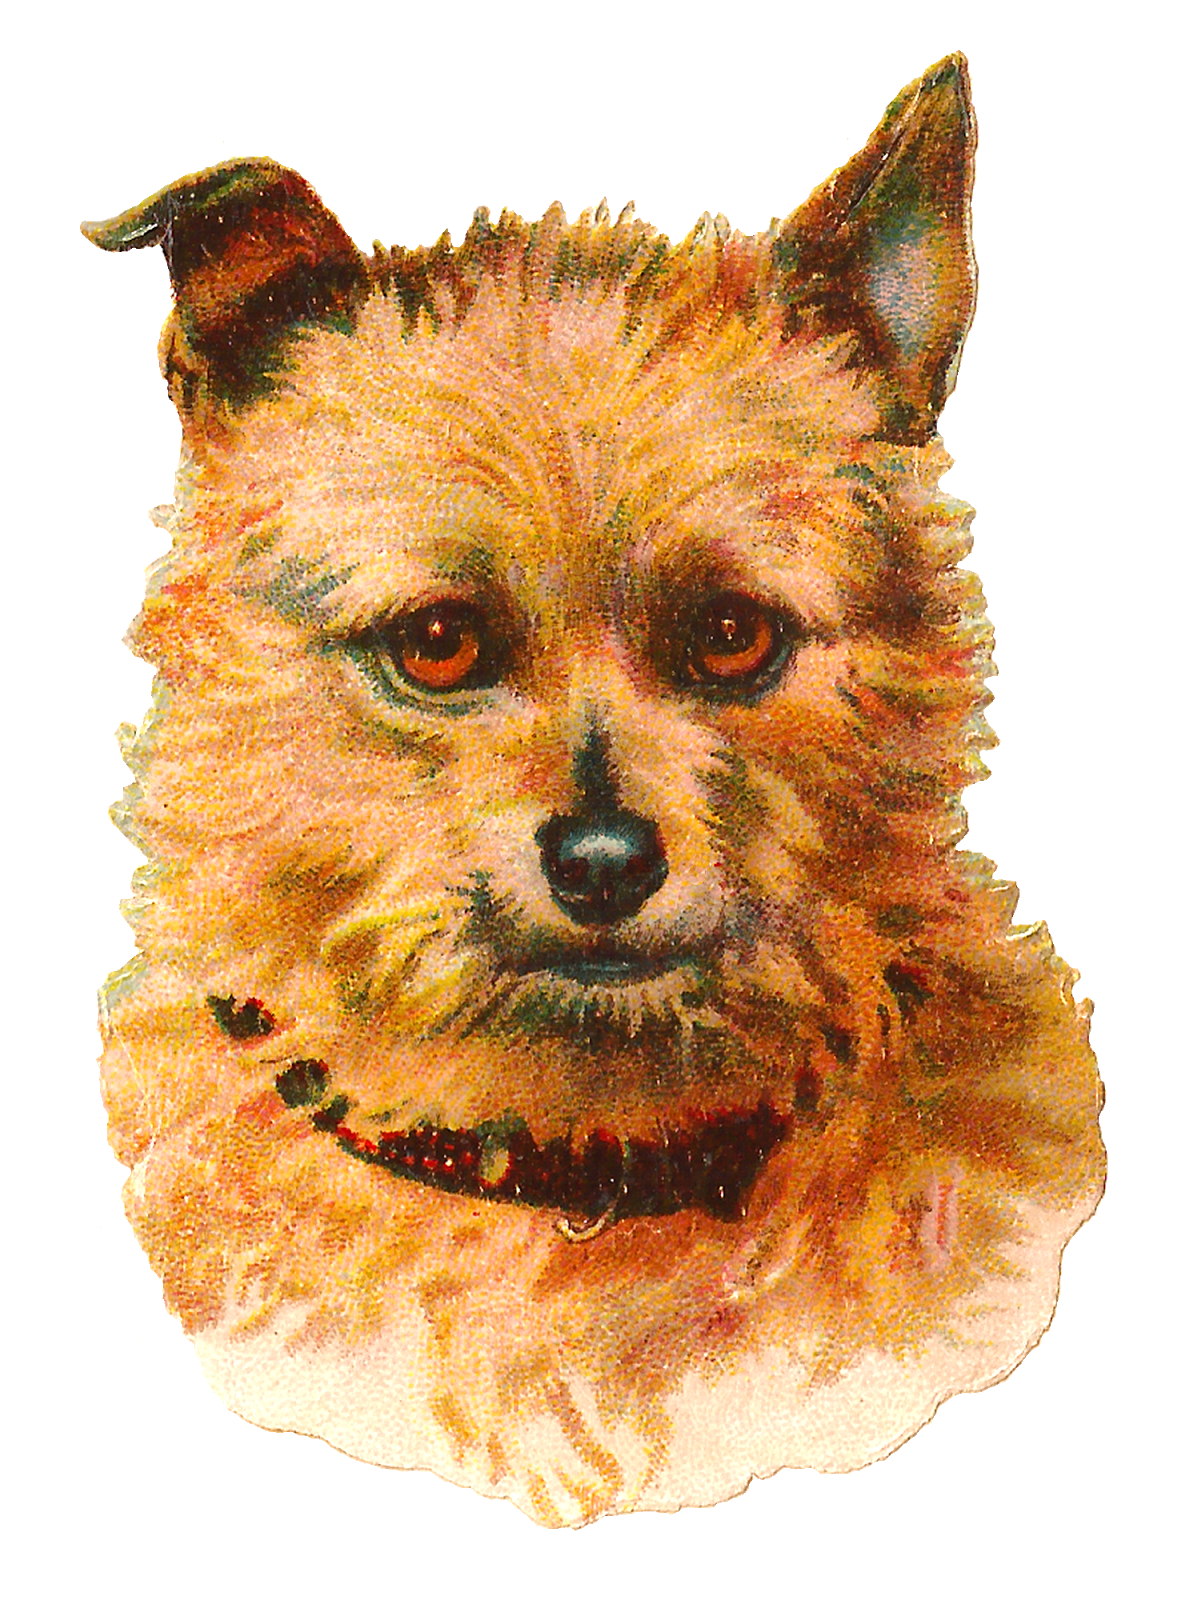 Terrier dog clipart clip art royalty free Antique Images: Dog Australian Terrier Vintage Animal Portrait Clip ... clip art royalty free